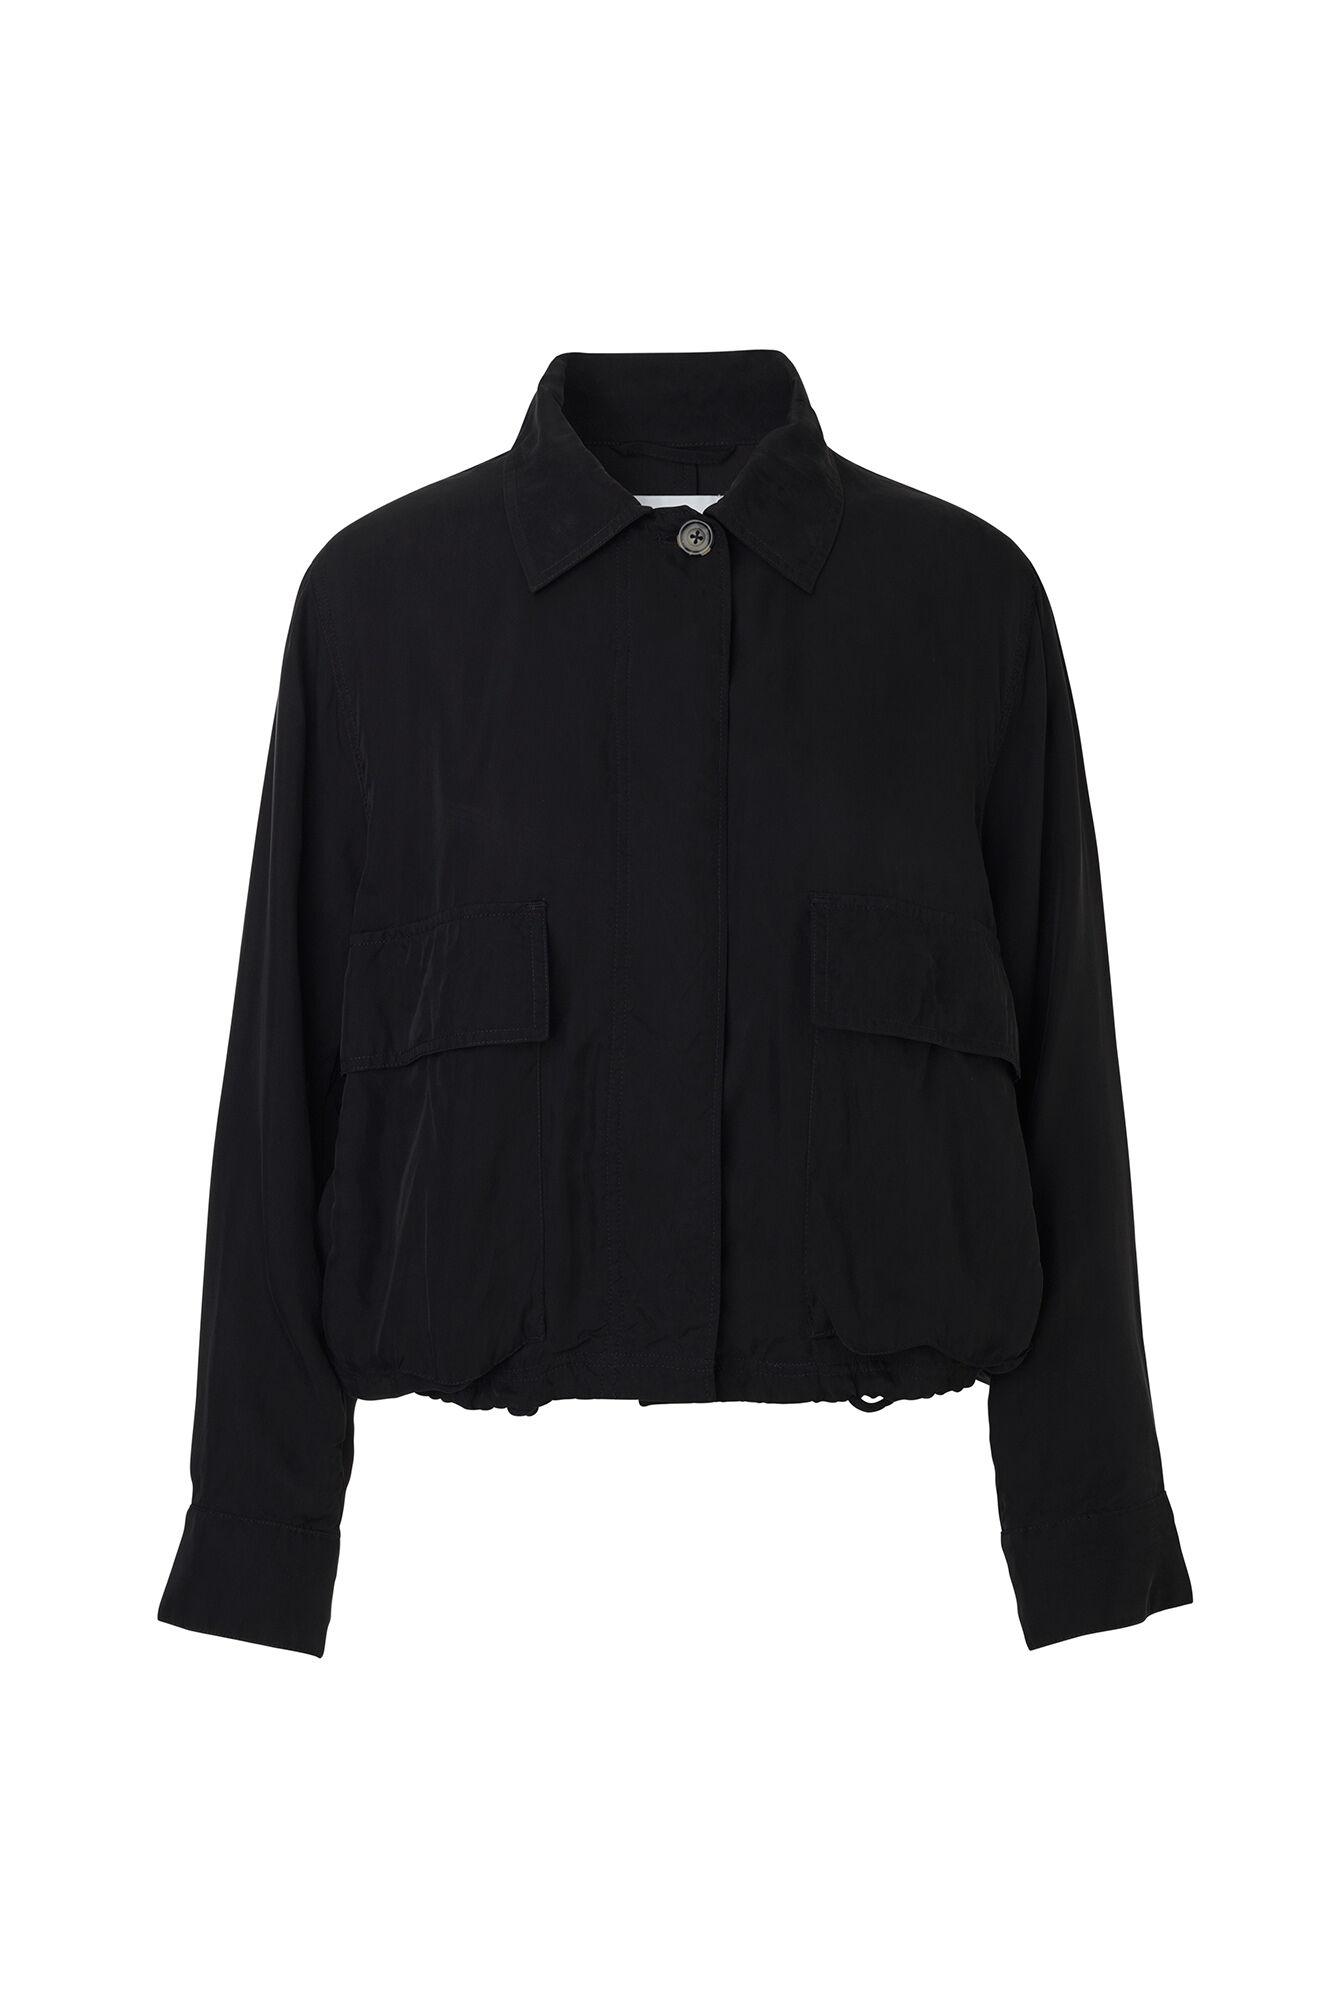 Pines jacket 9729